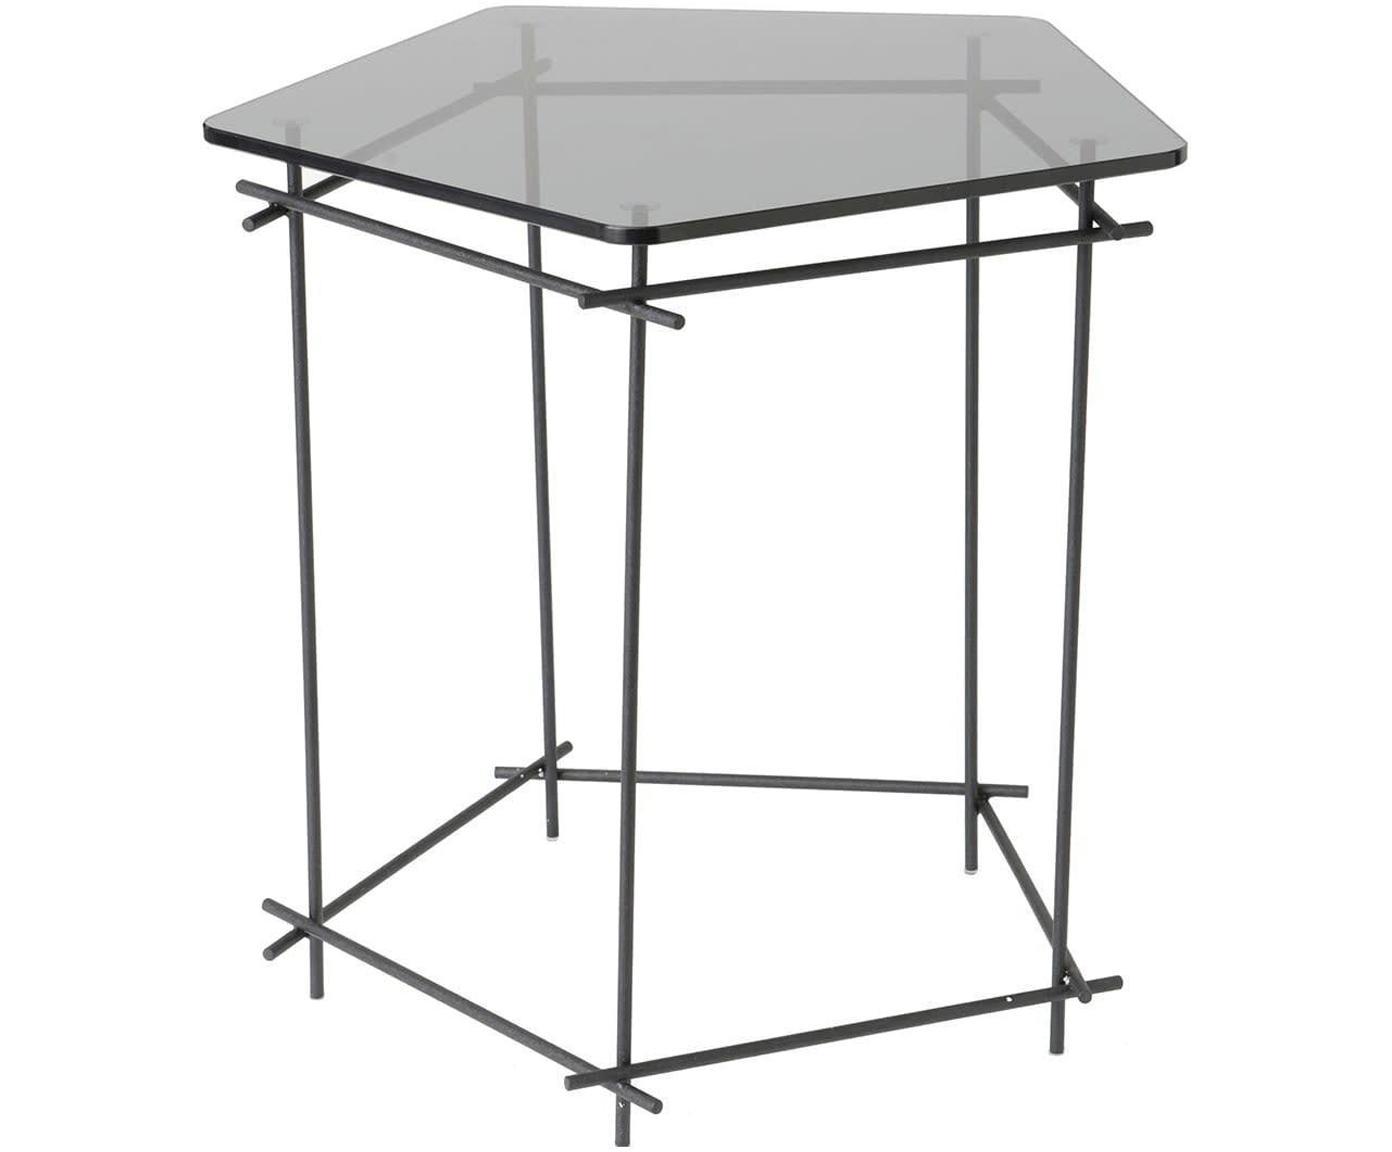 Mesa auxiliar Haxa, Tablero: vidrio, Negro, An 53 x F 51 cm